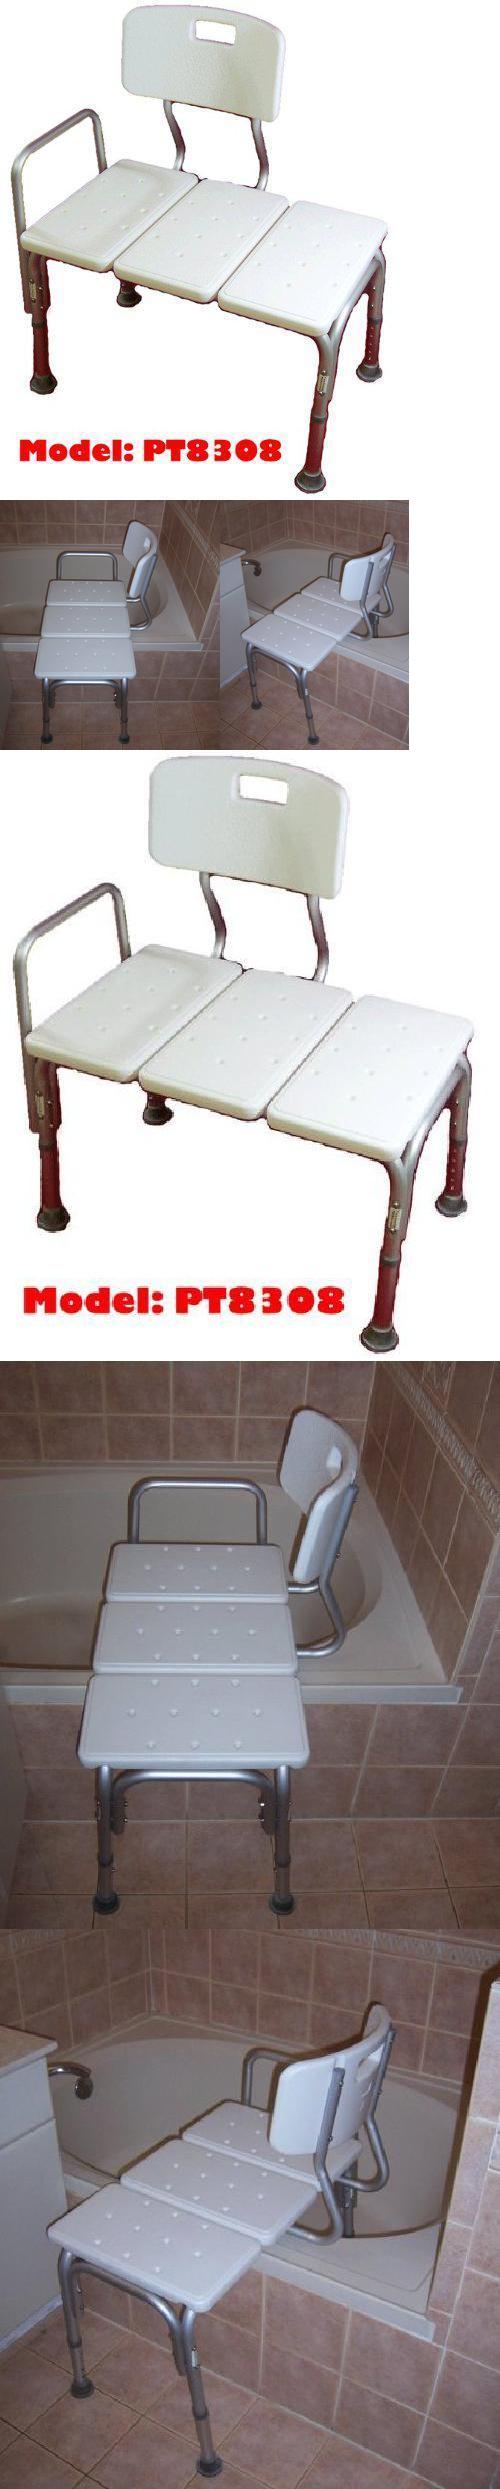 Transfer Boards and Benches: Medmobile® Bathtub Transfer Bench Bath ...